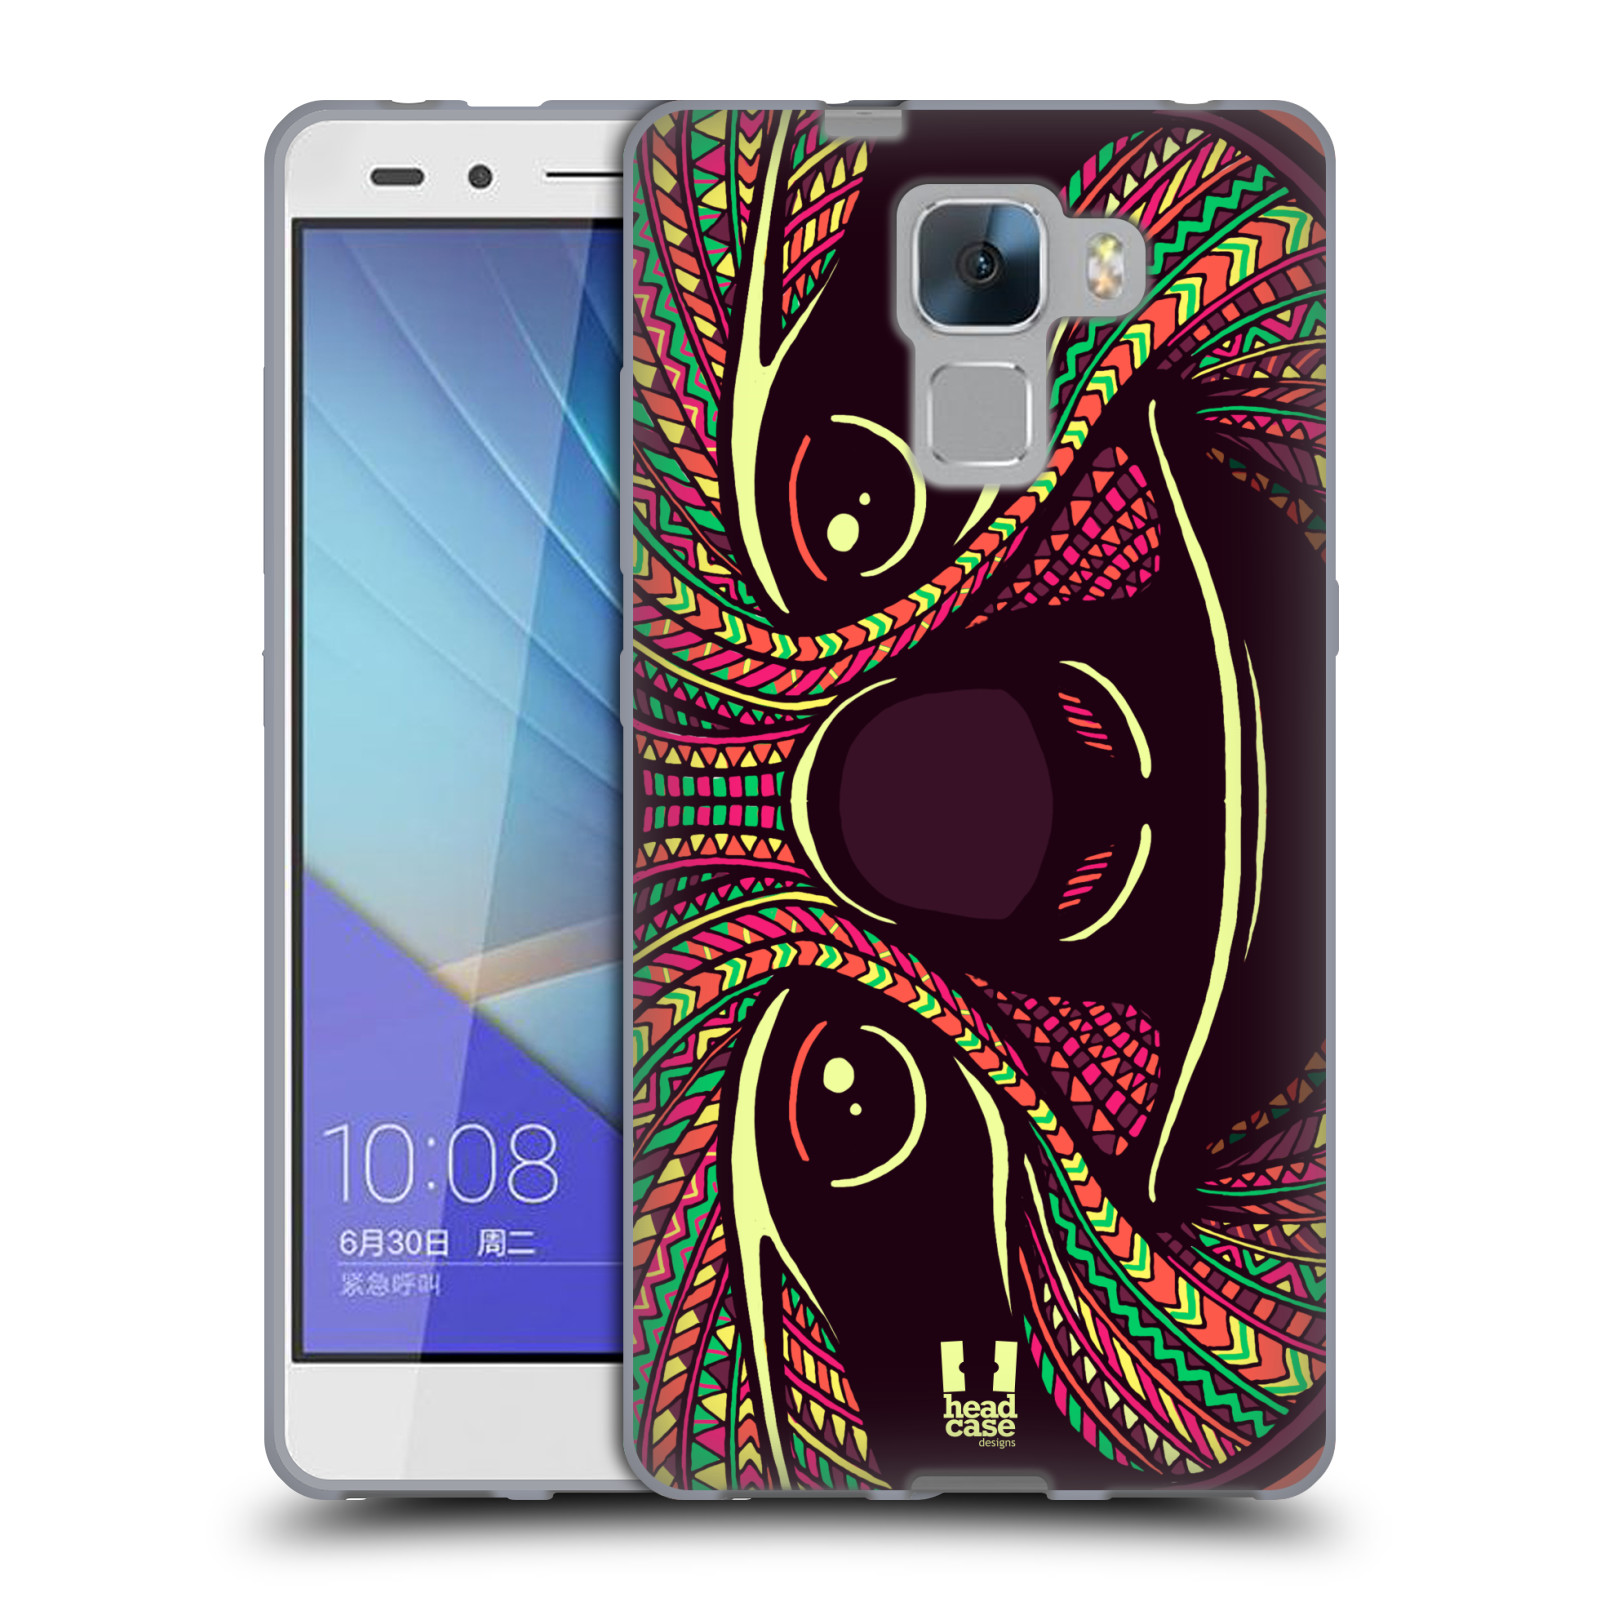 Silikonové pouzdro na mobil Honor 7 HEAD CASE AZTEC LENOCHOD